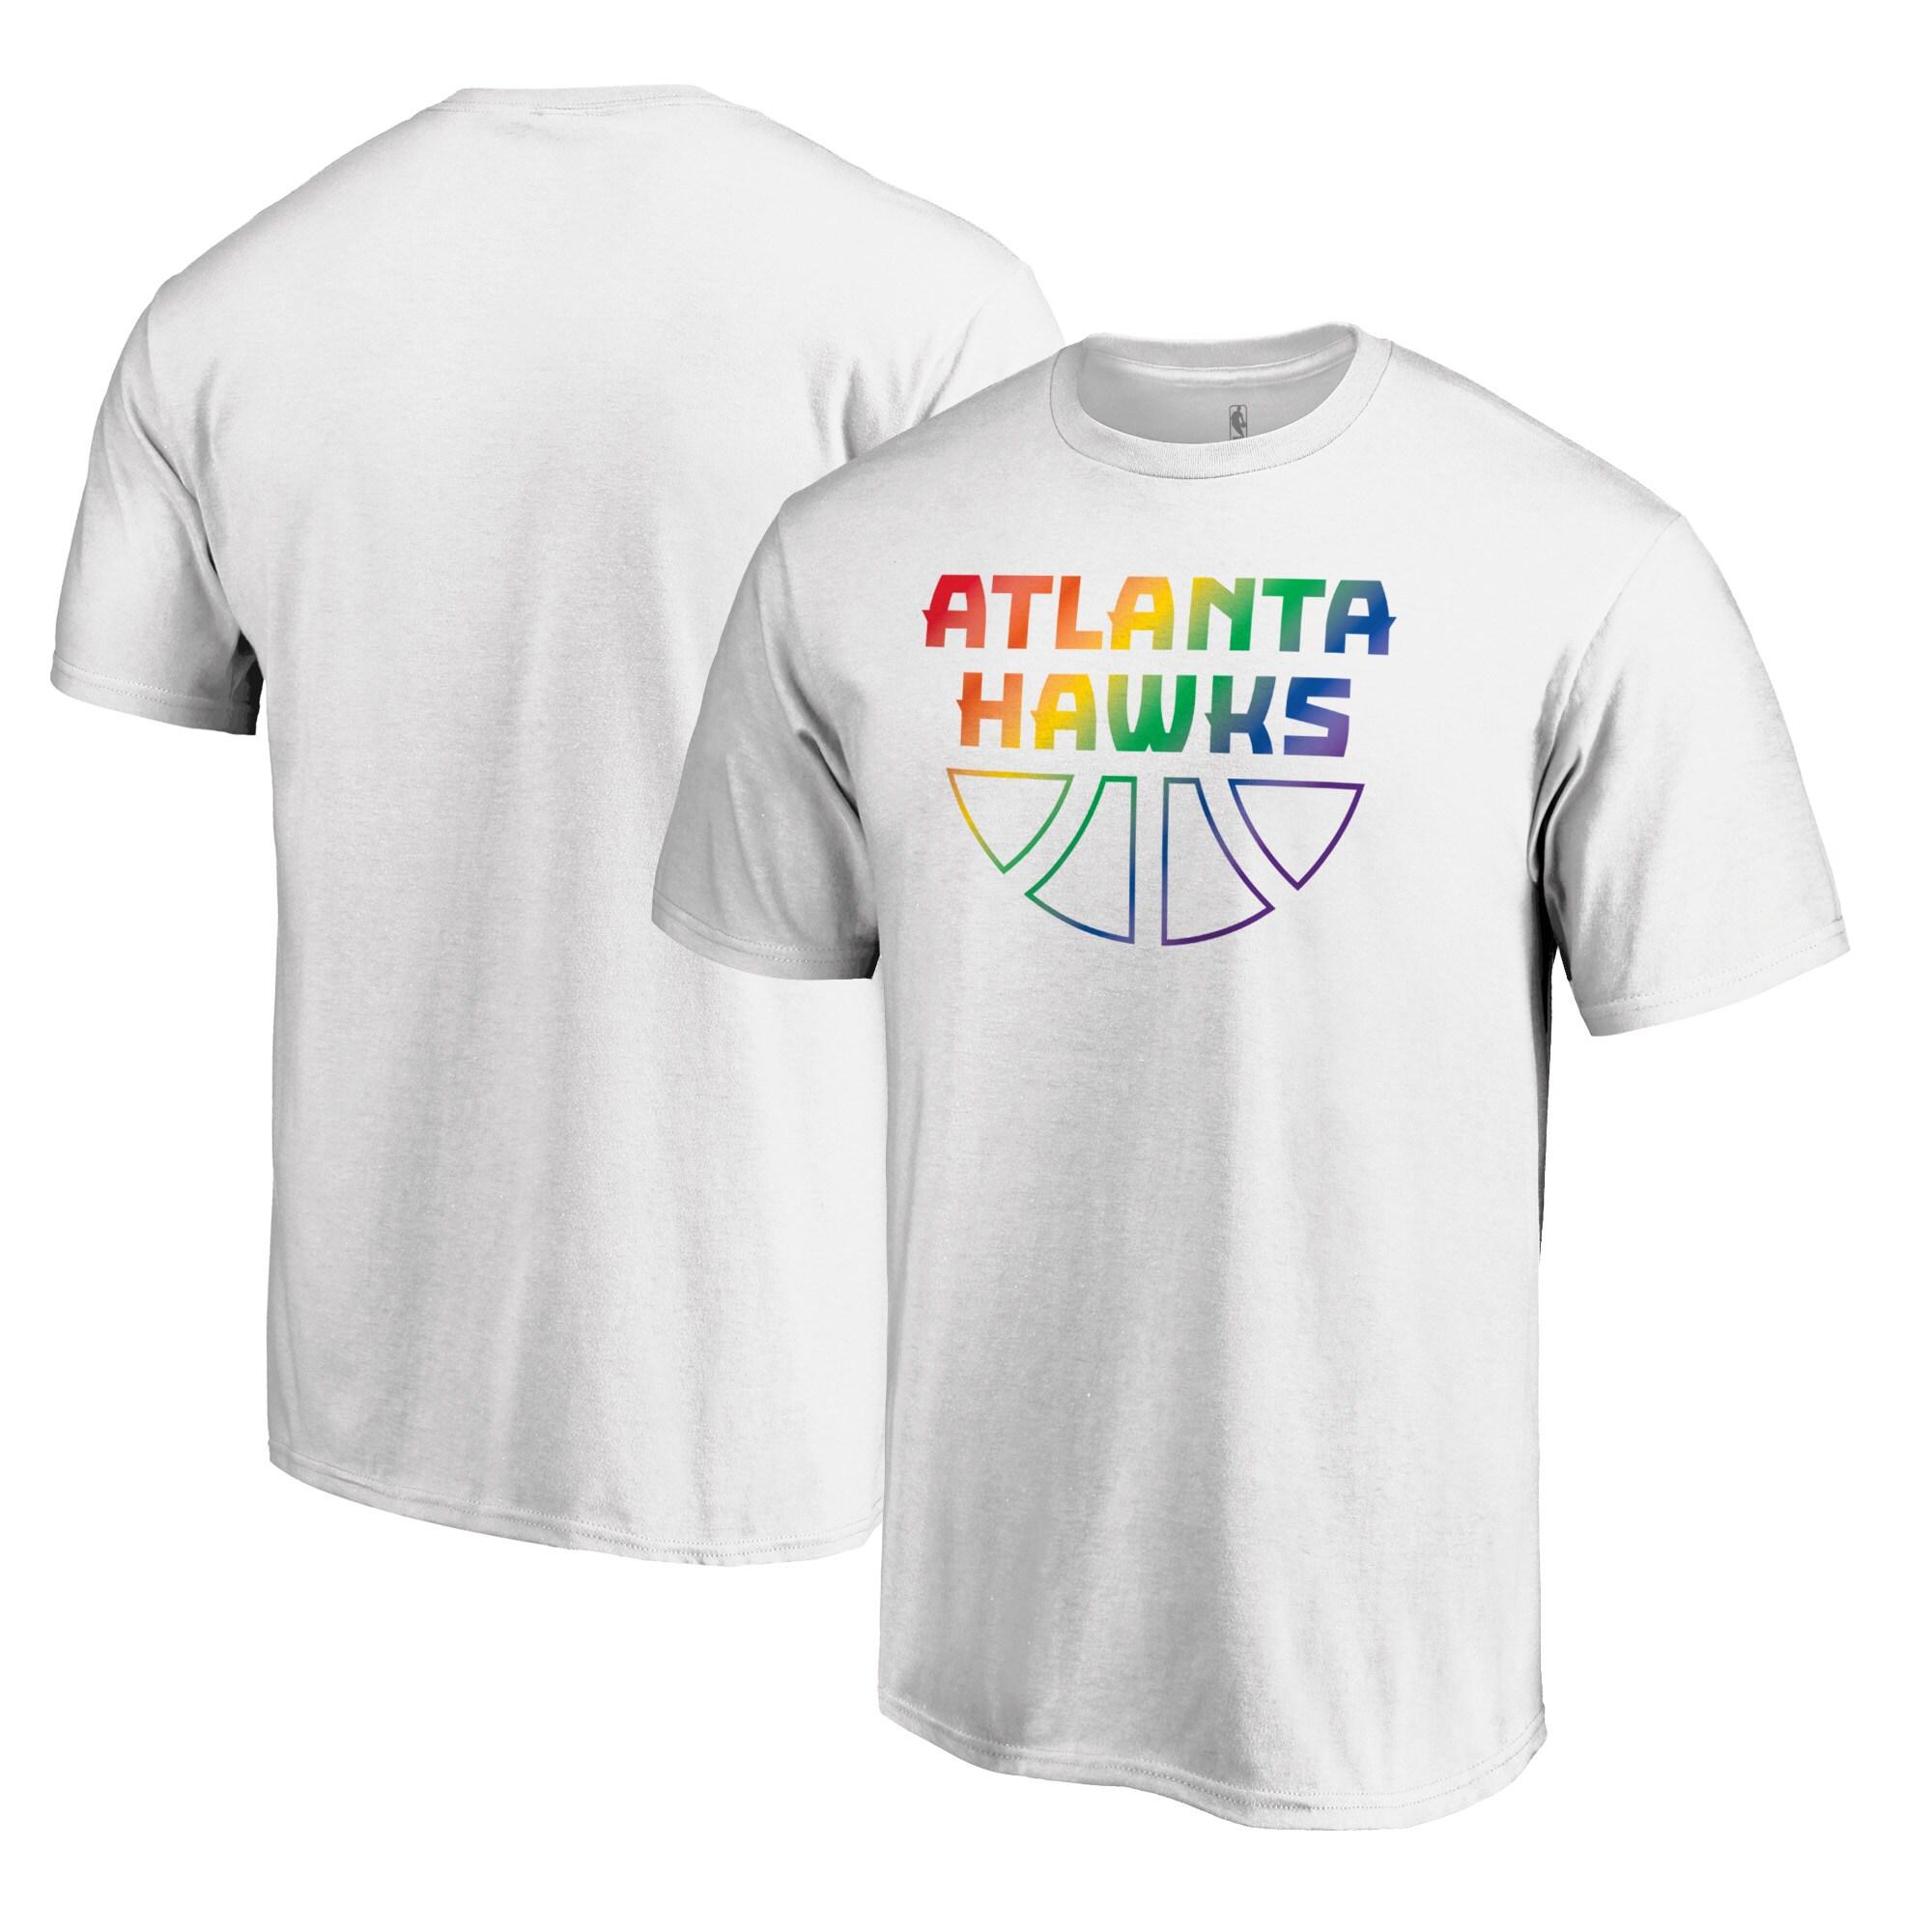 Atlanta Hawks Fanatics Branded Team Pride Wordmark T-Shirt - White